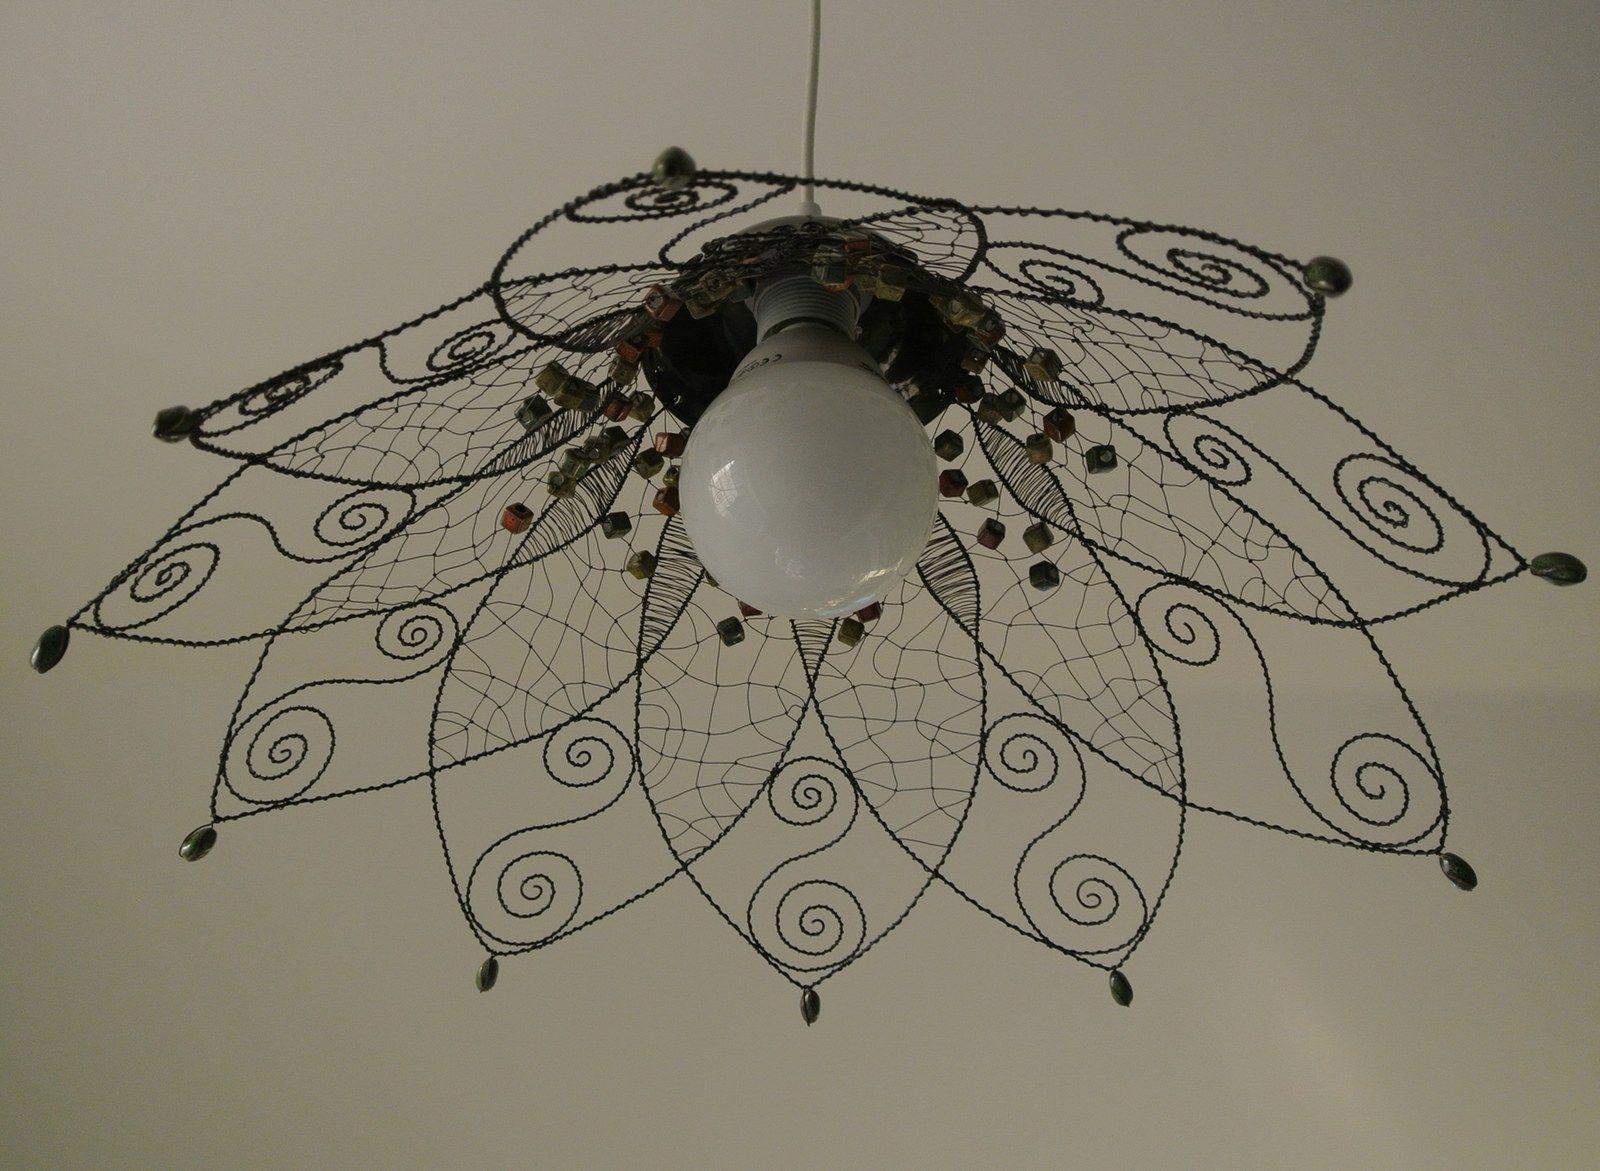 Stnidlo s keramikou druh drtek pinterest wire art wire stnidlo s keramikou druh wire lampshadelampshade ideaslampshadeswire greentooth Choice Image